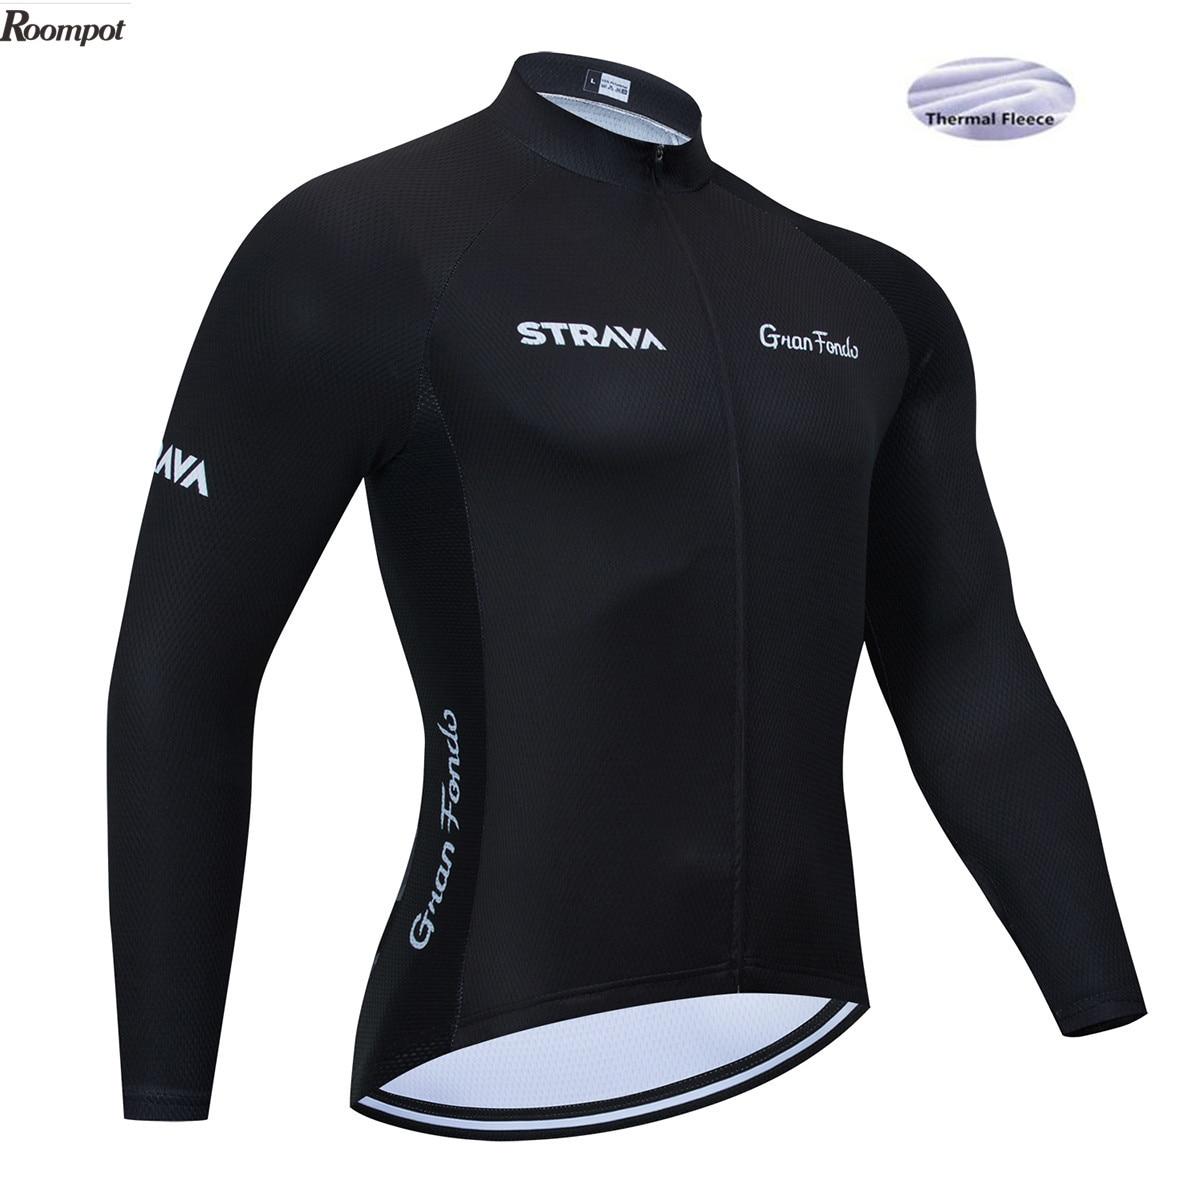 6XL 2020 nueva ropa para equipo de ciclismo STRAVA, jersey de bicicleta de secado rápido para hombres, bicicleta de invierno, camisetas de ciclismo profesional, Maillot de bicicleta